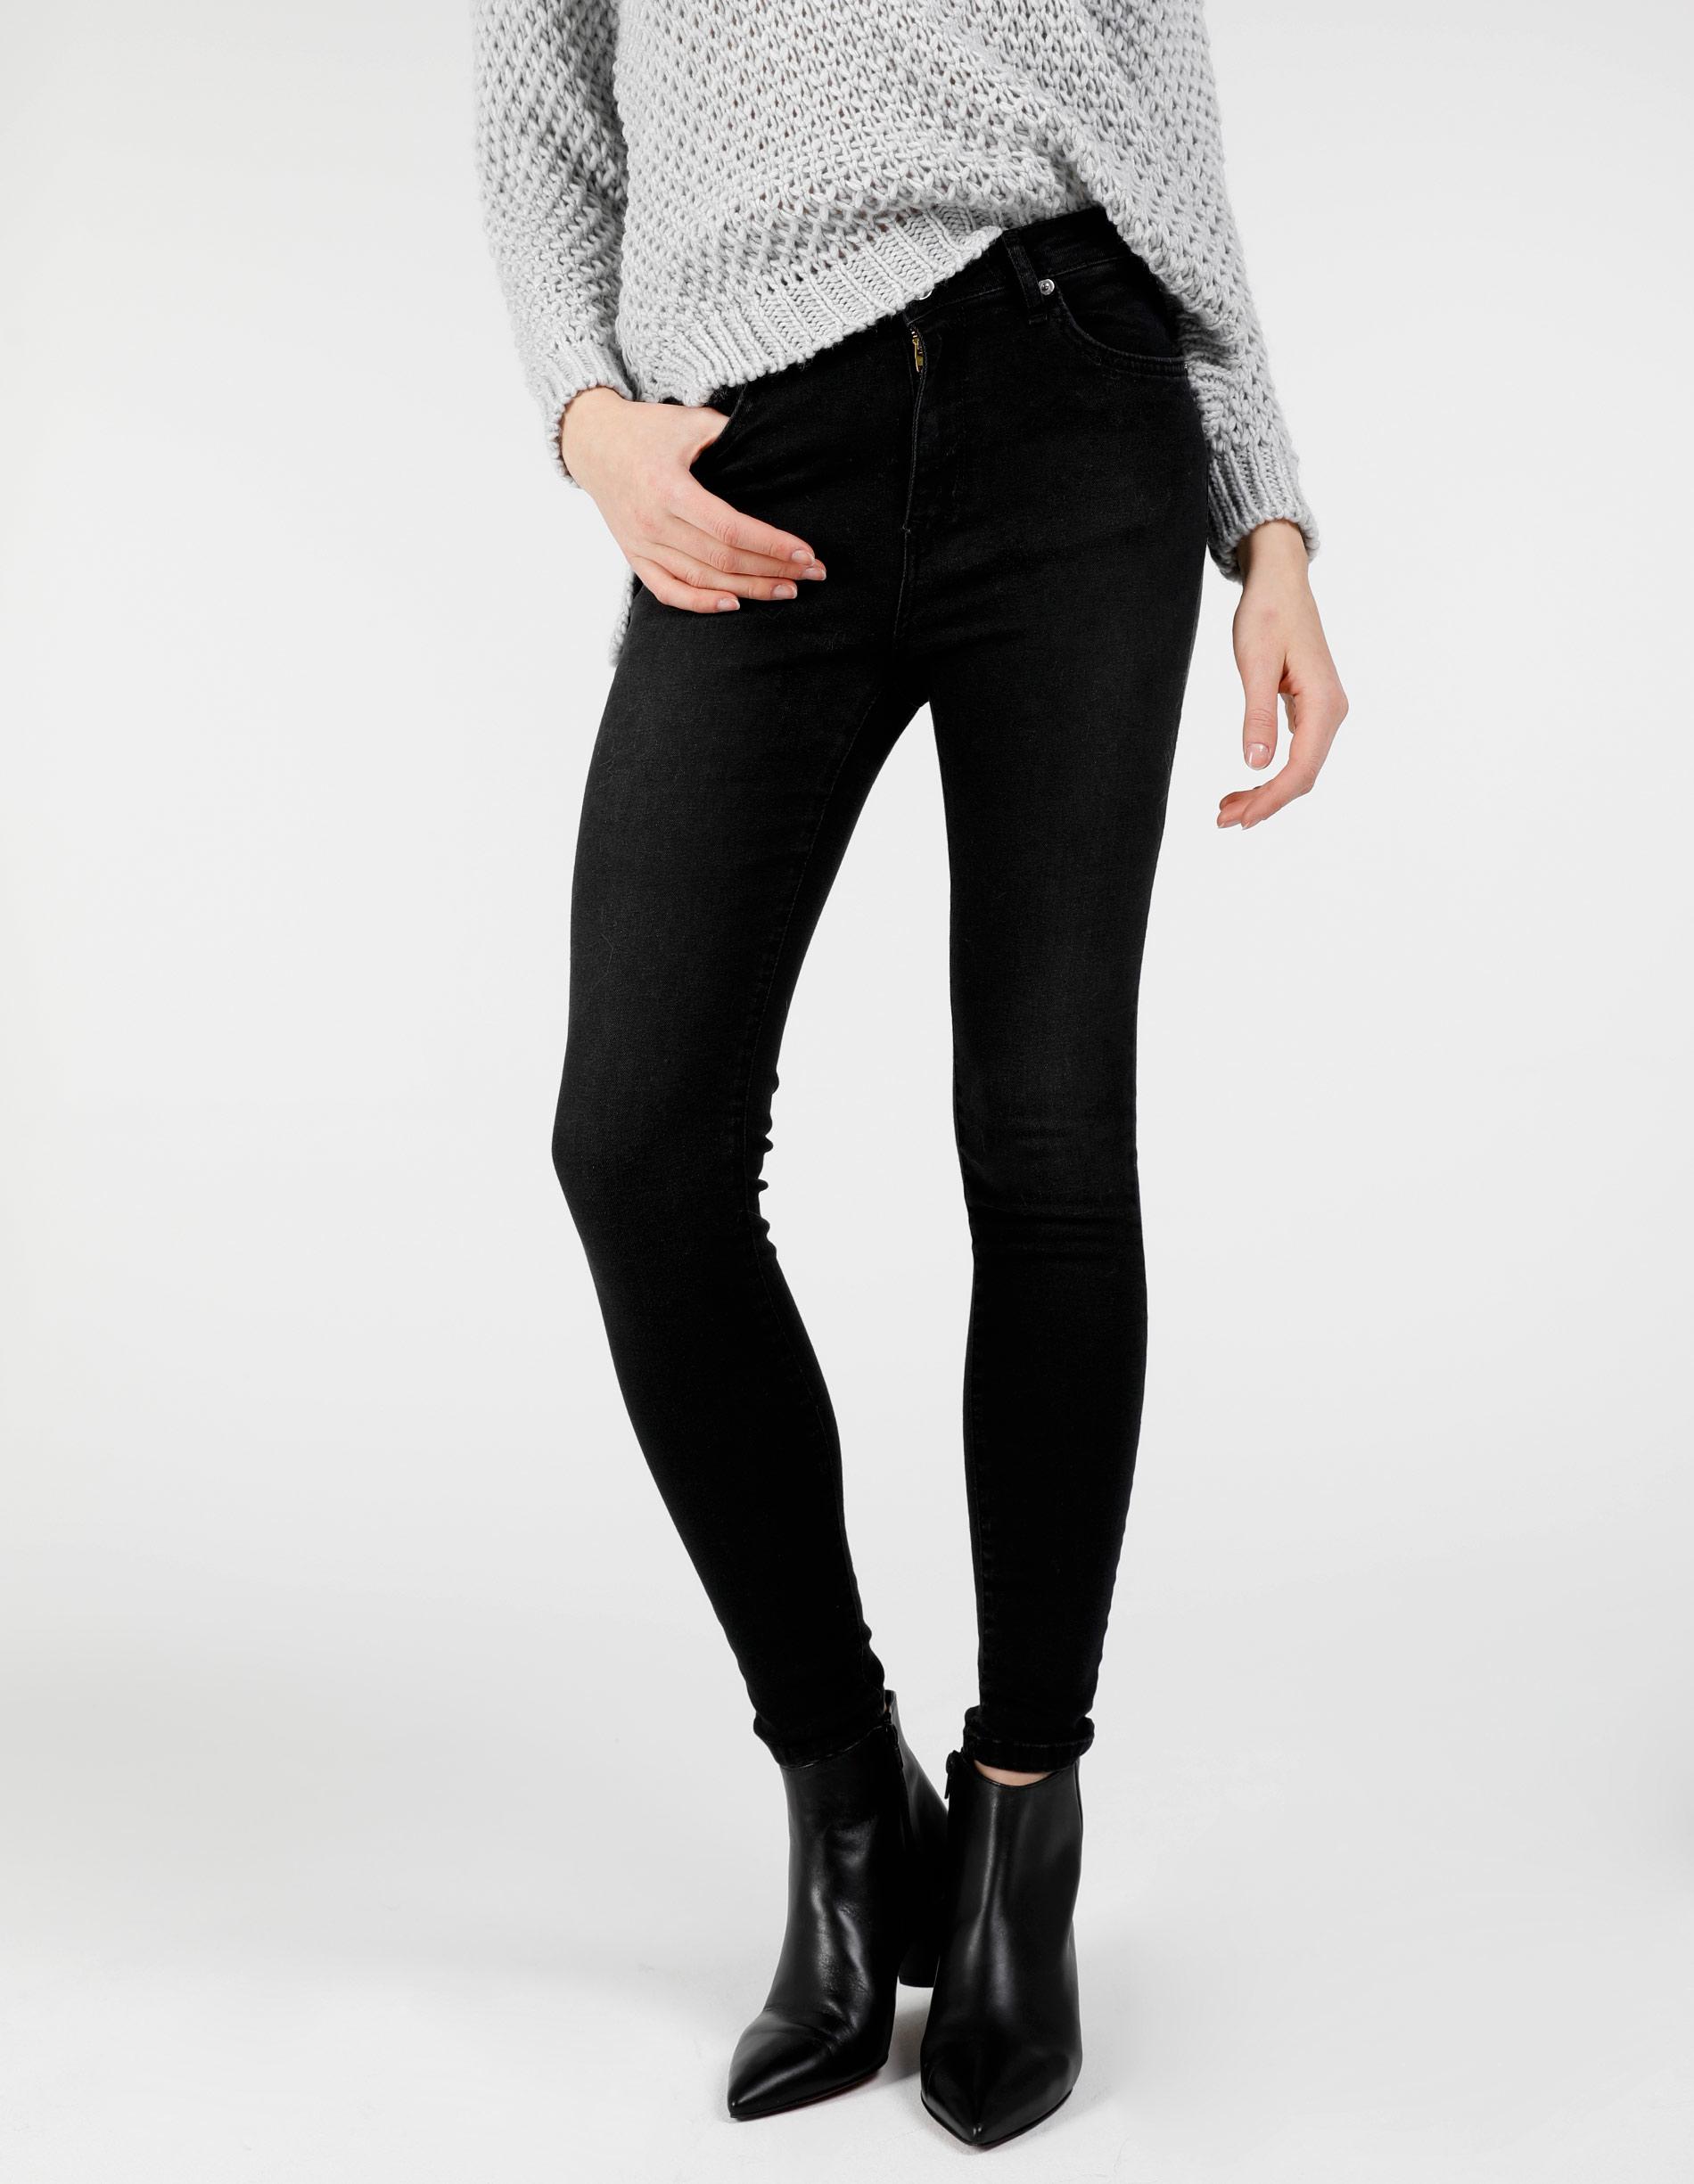 Spodnie - 1-12633 BLACK - Unisono